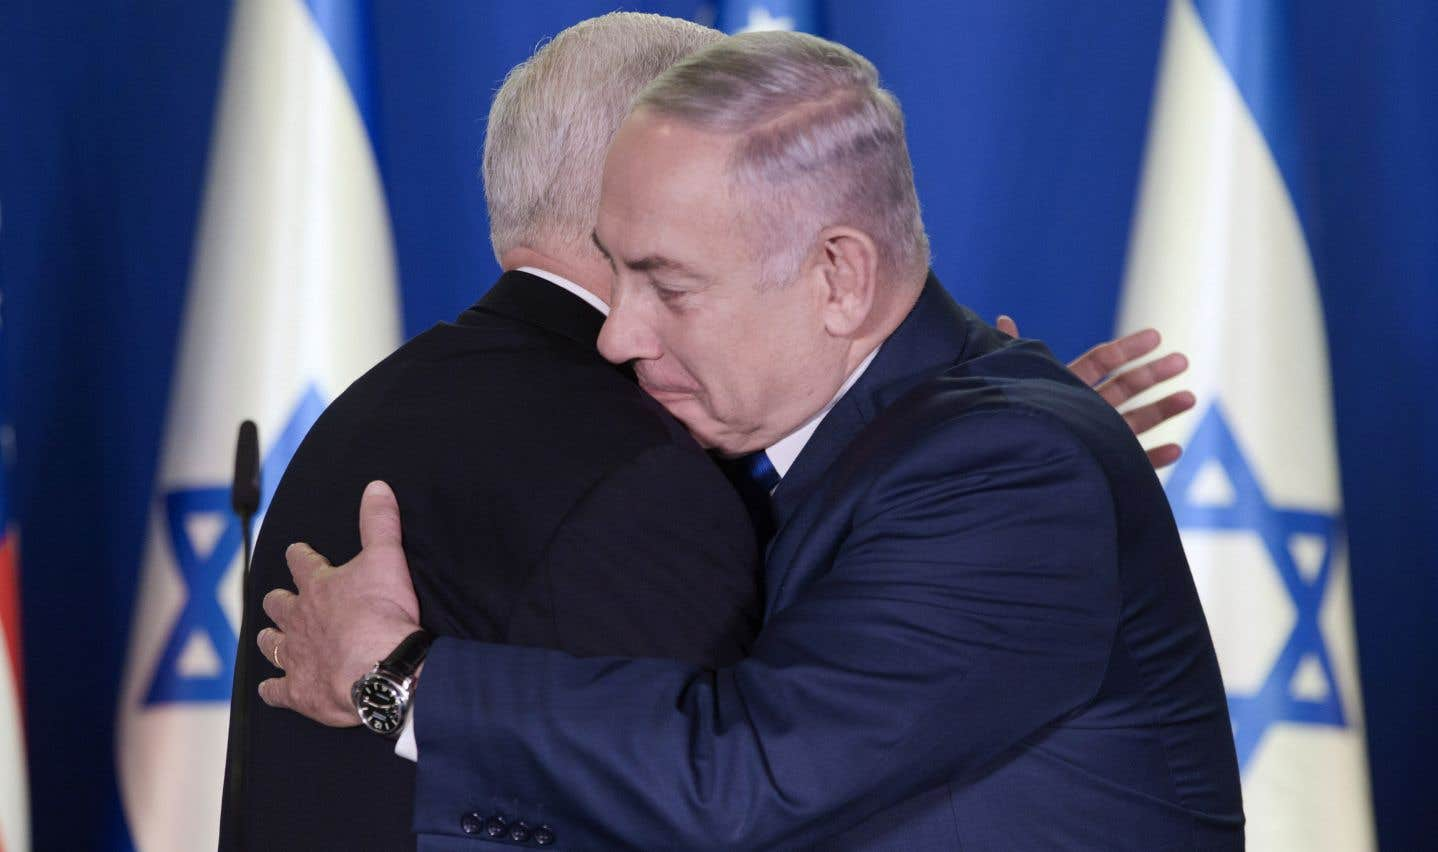 Ambassade à Jérusalem: Mike Pence persiste et signe